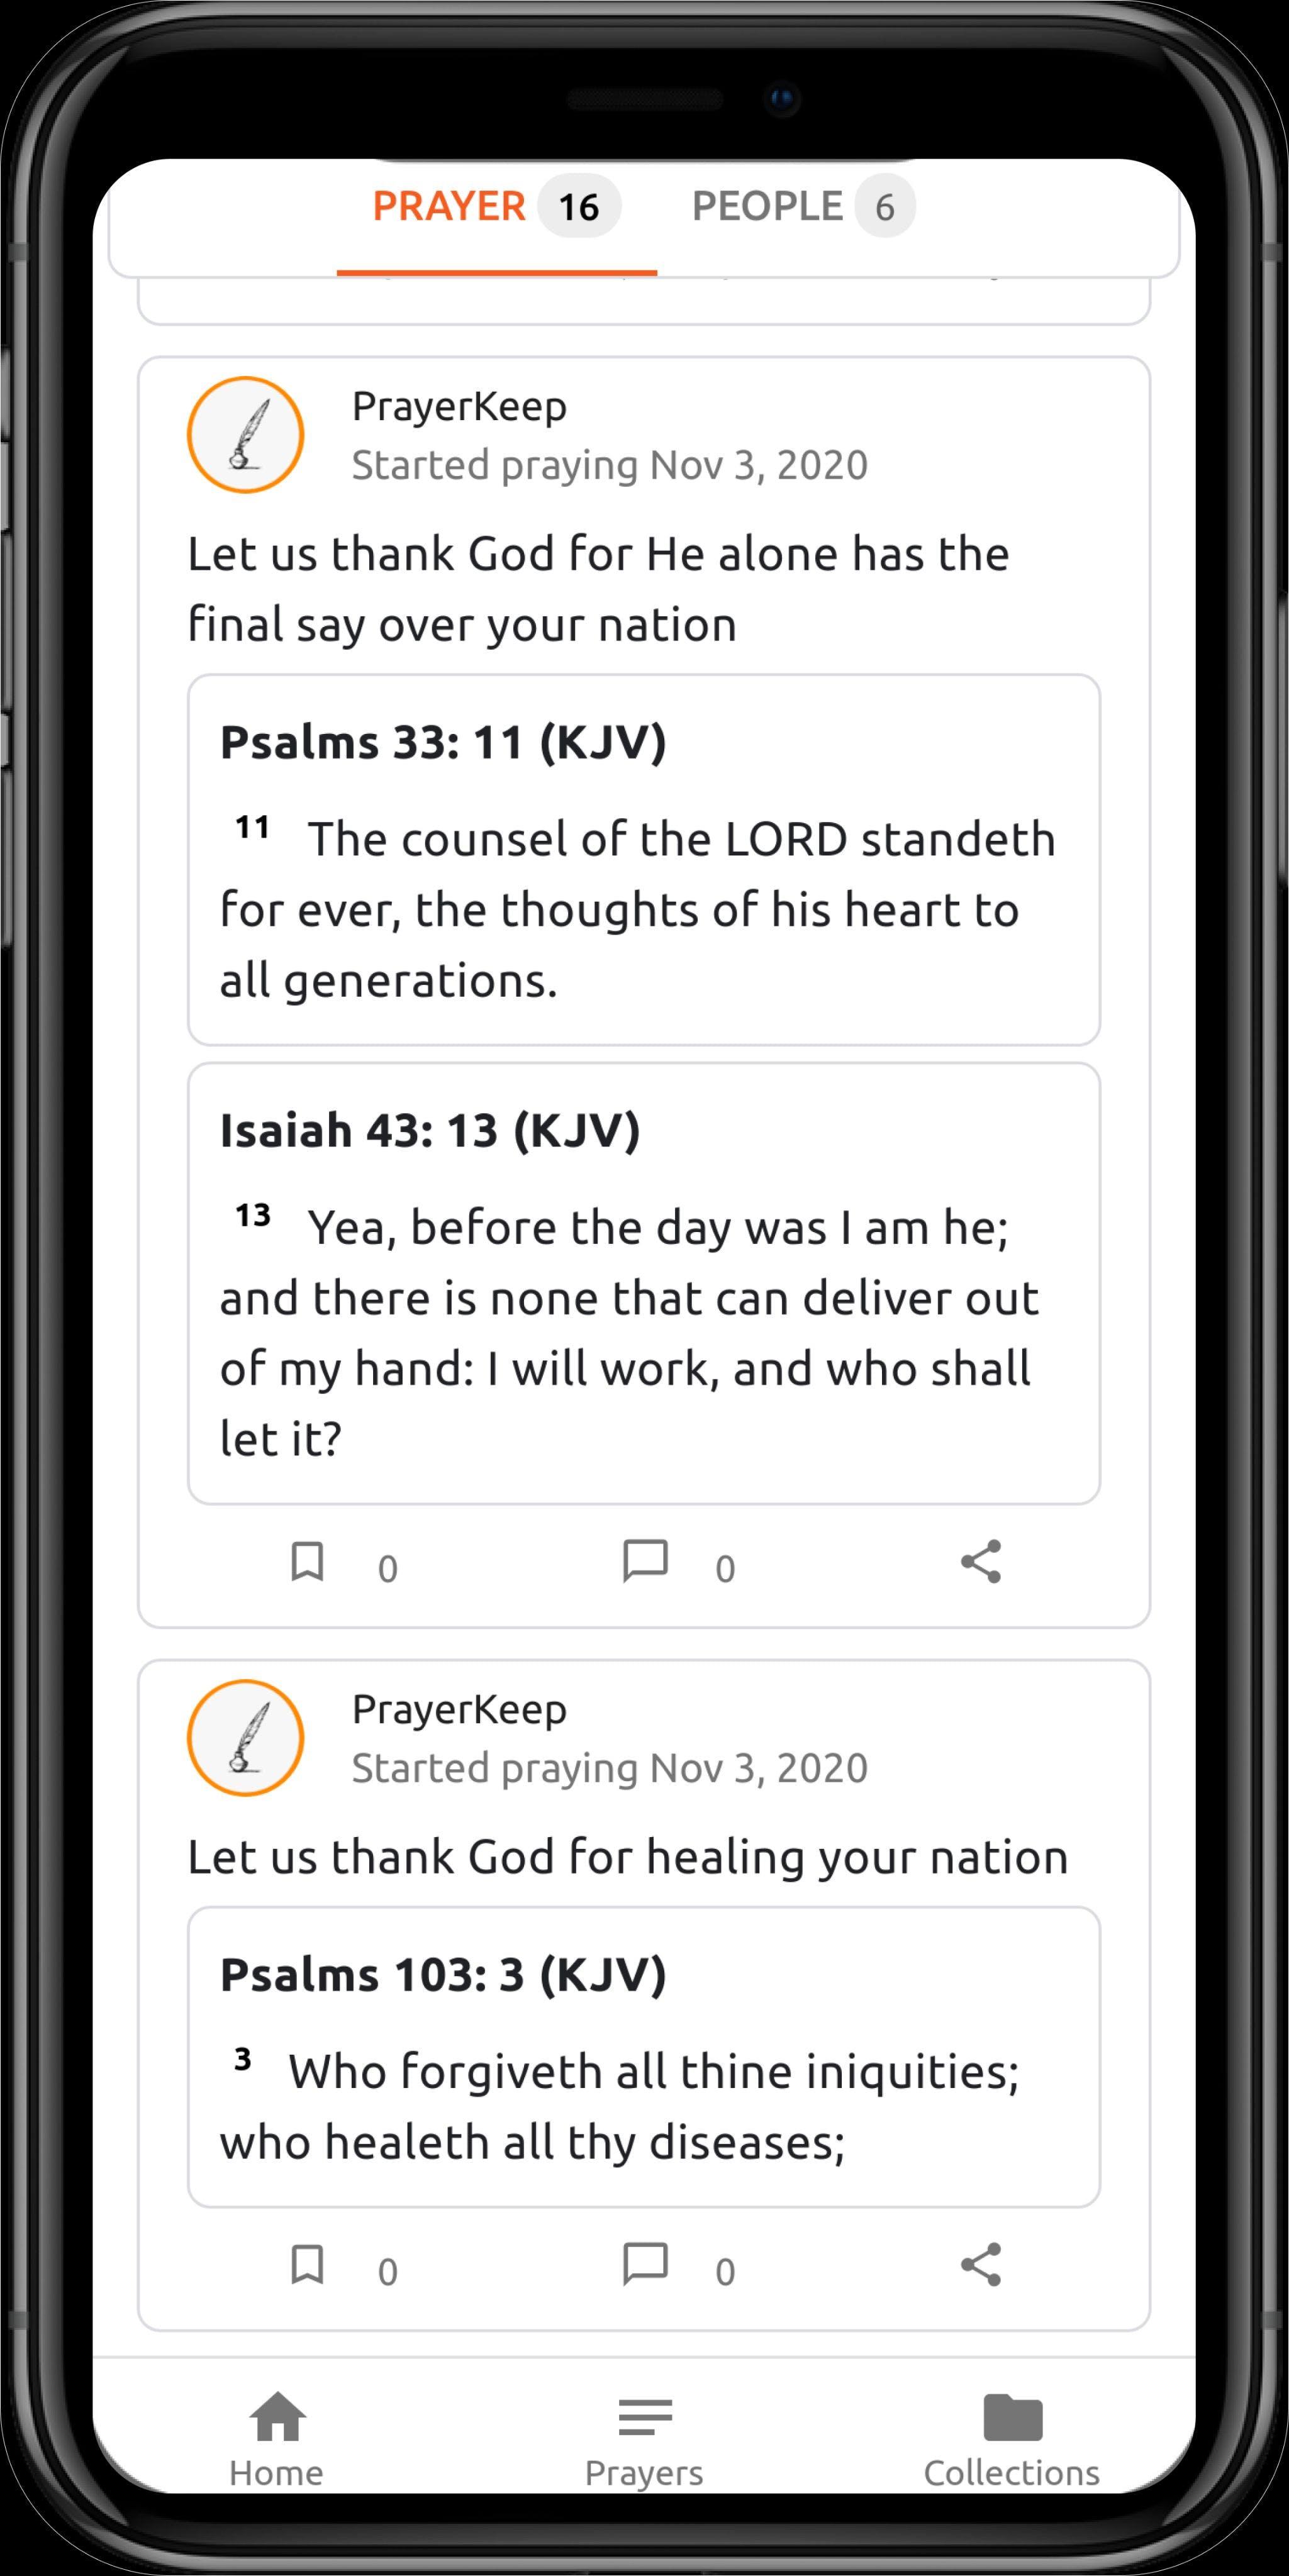 prayer-keep-collection-mobile-2.png